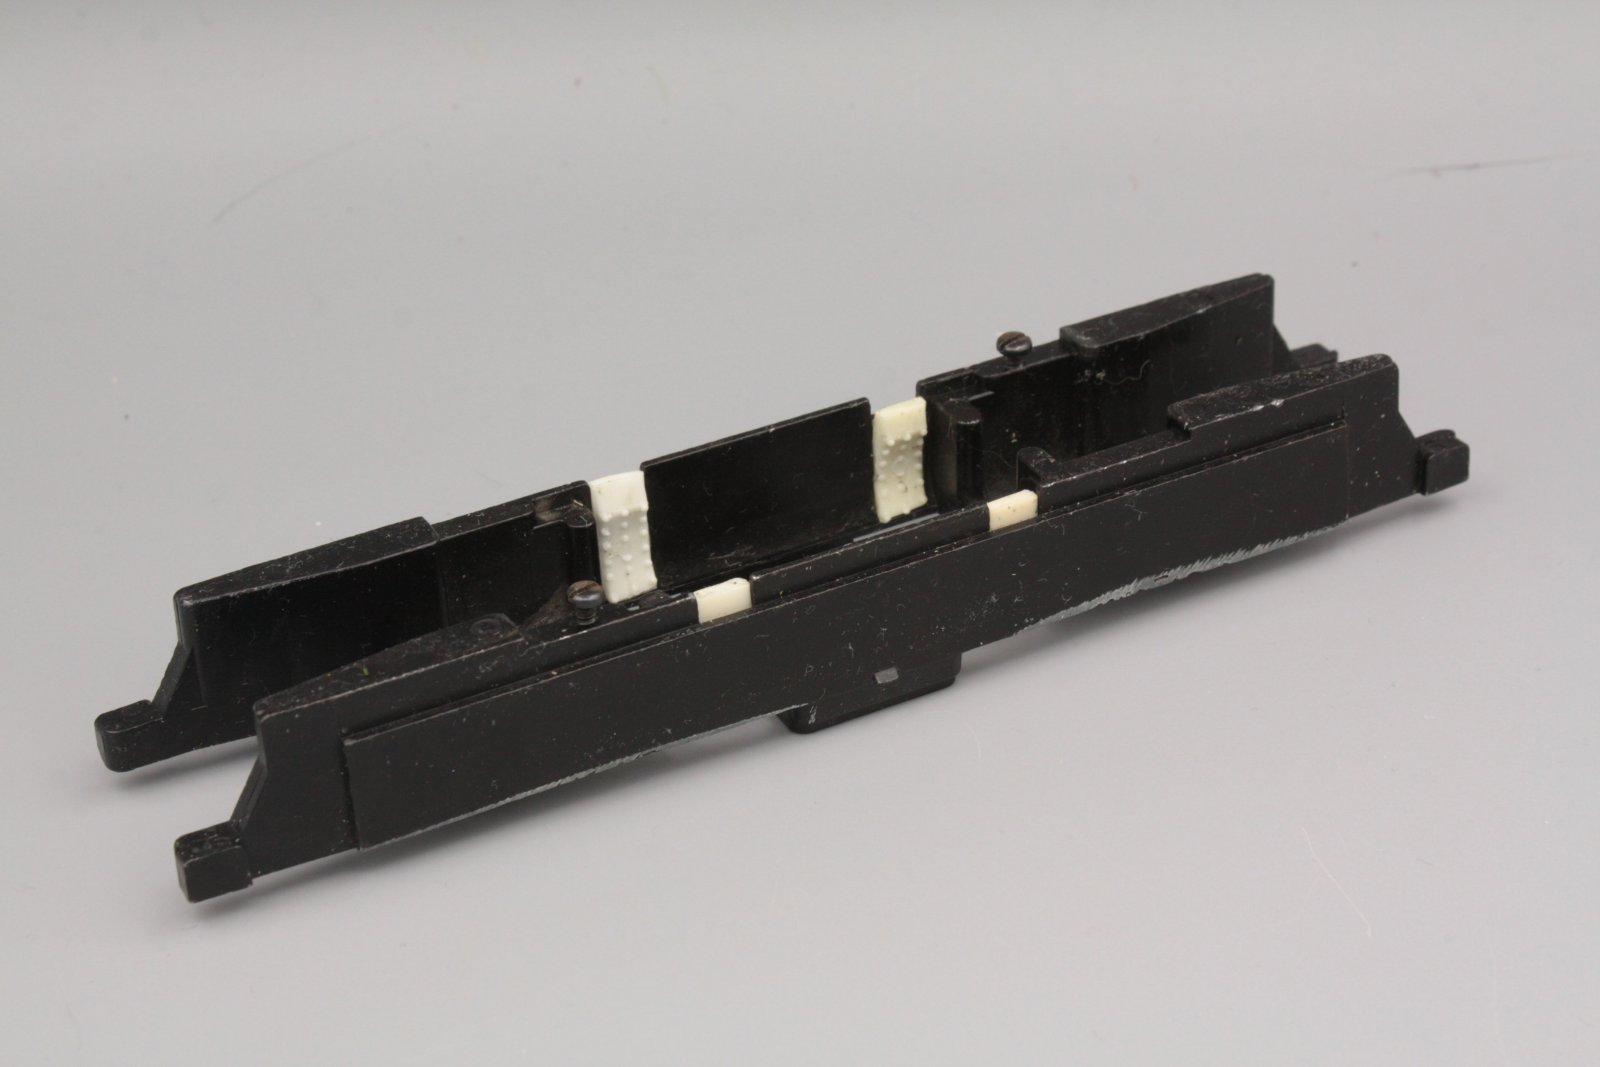 Ersatzteil Roco 110 / 140 Lokrahmen - schwarz - hoher Rahmen